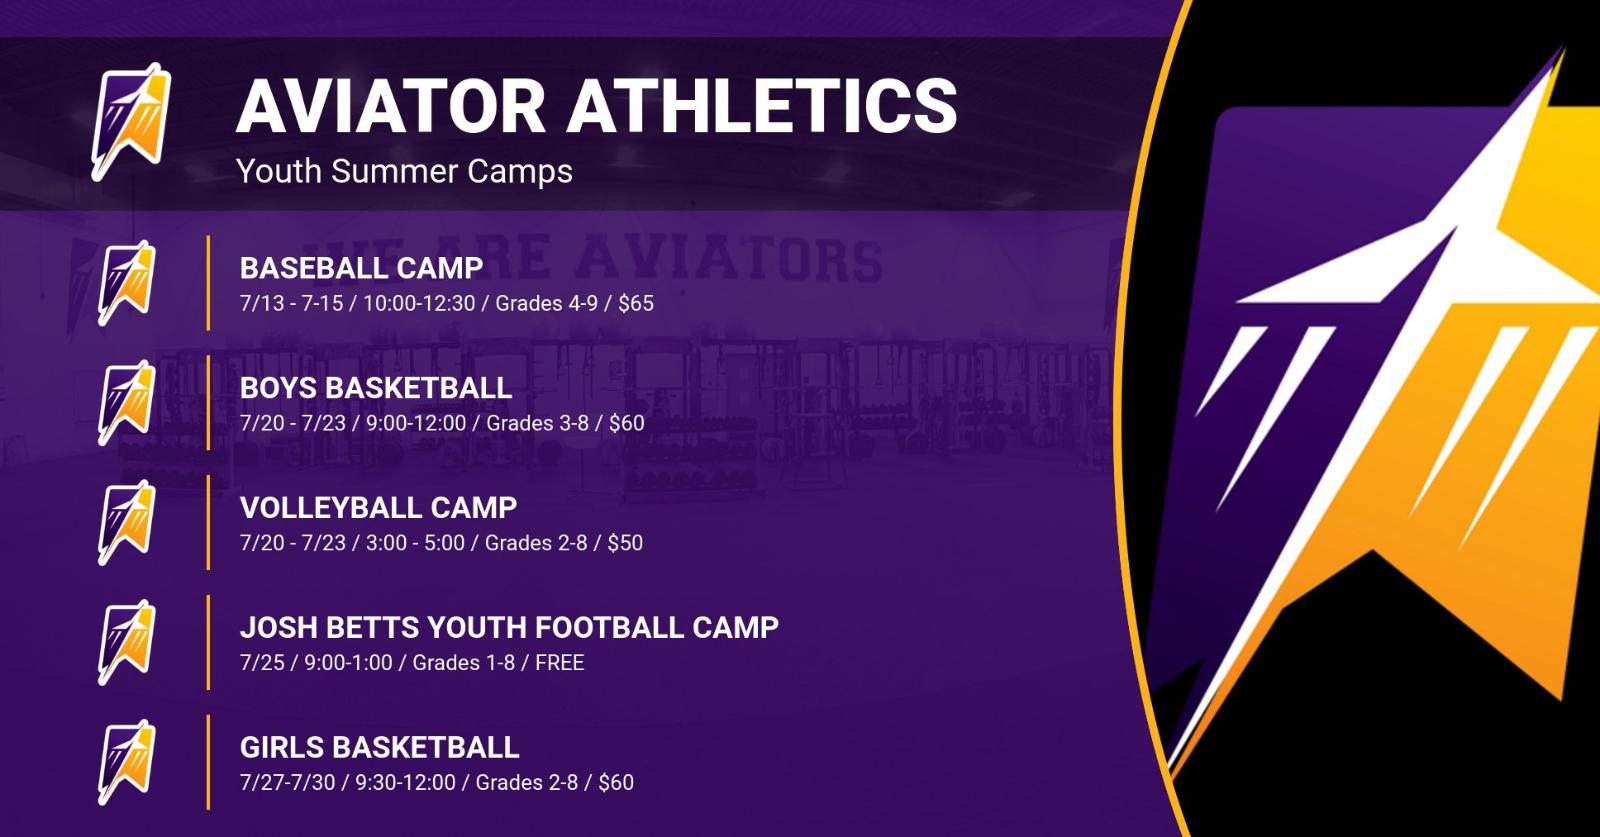 Aviator Athletics Summer Camps